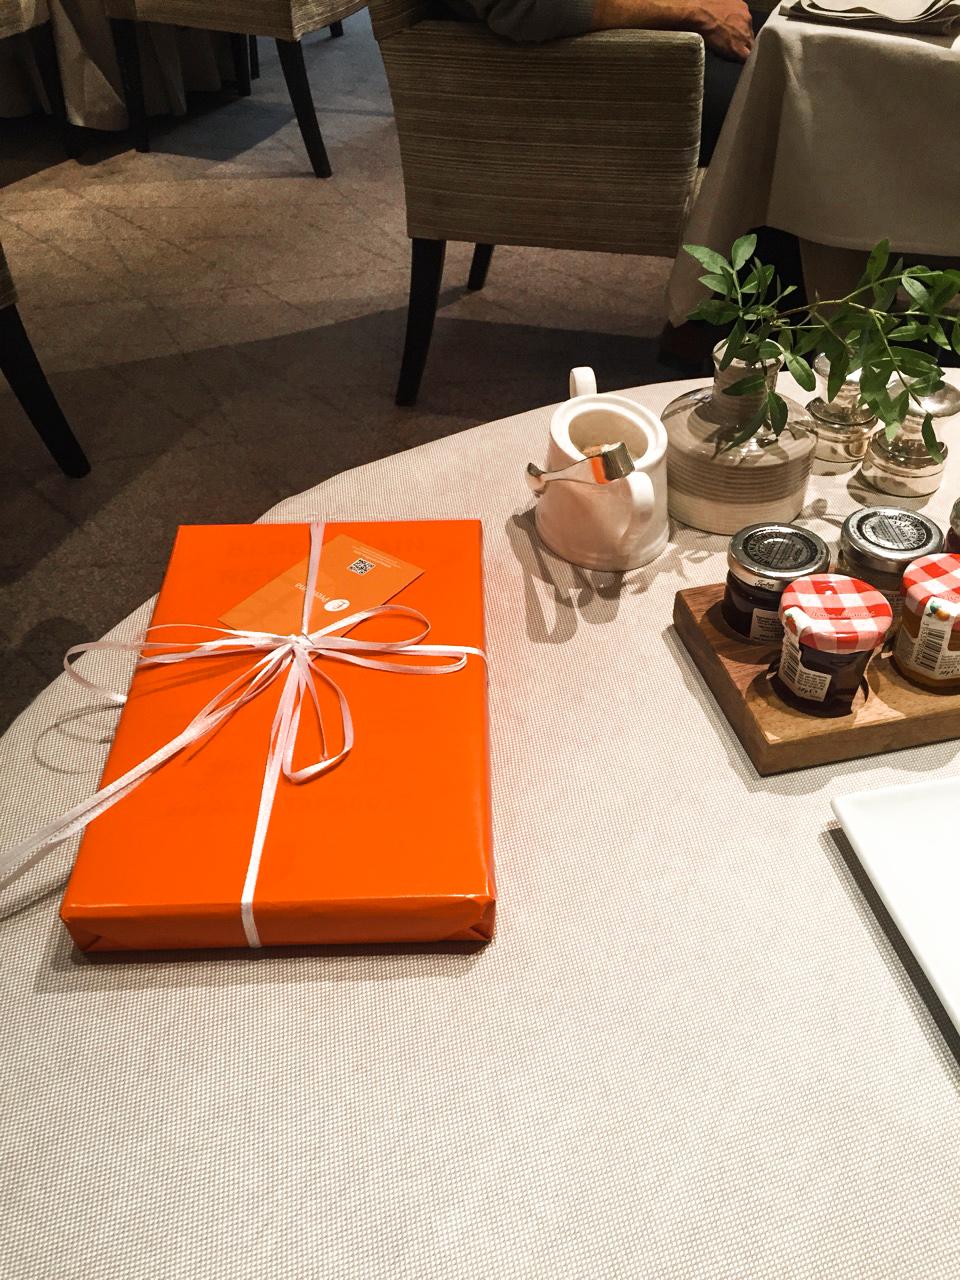 Vineyard, Broker, Insurance, PremFina, Retreat, Event, Gift, Dinner